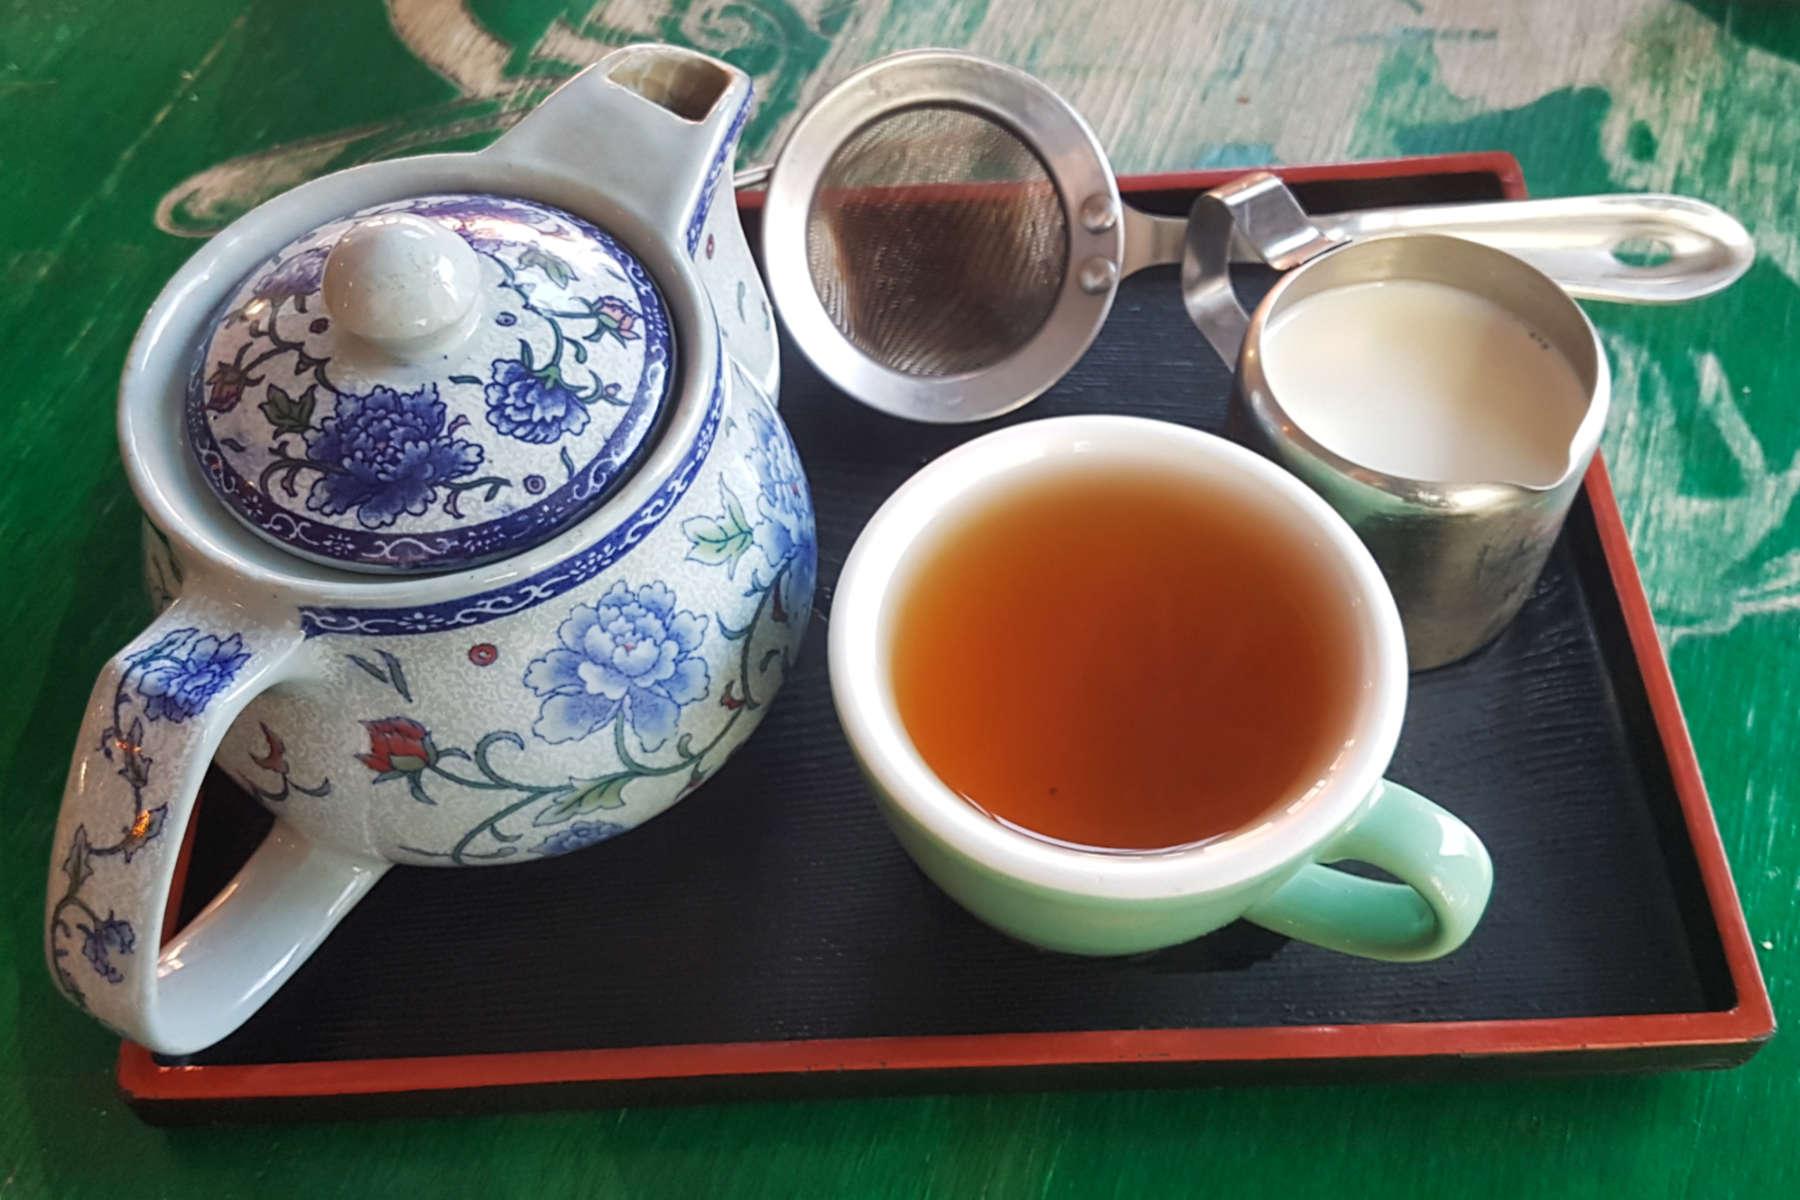 Gypsy kitchen tea